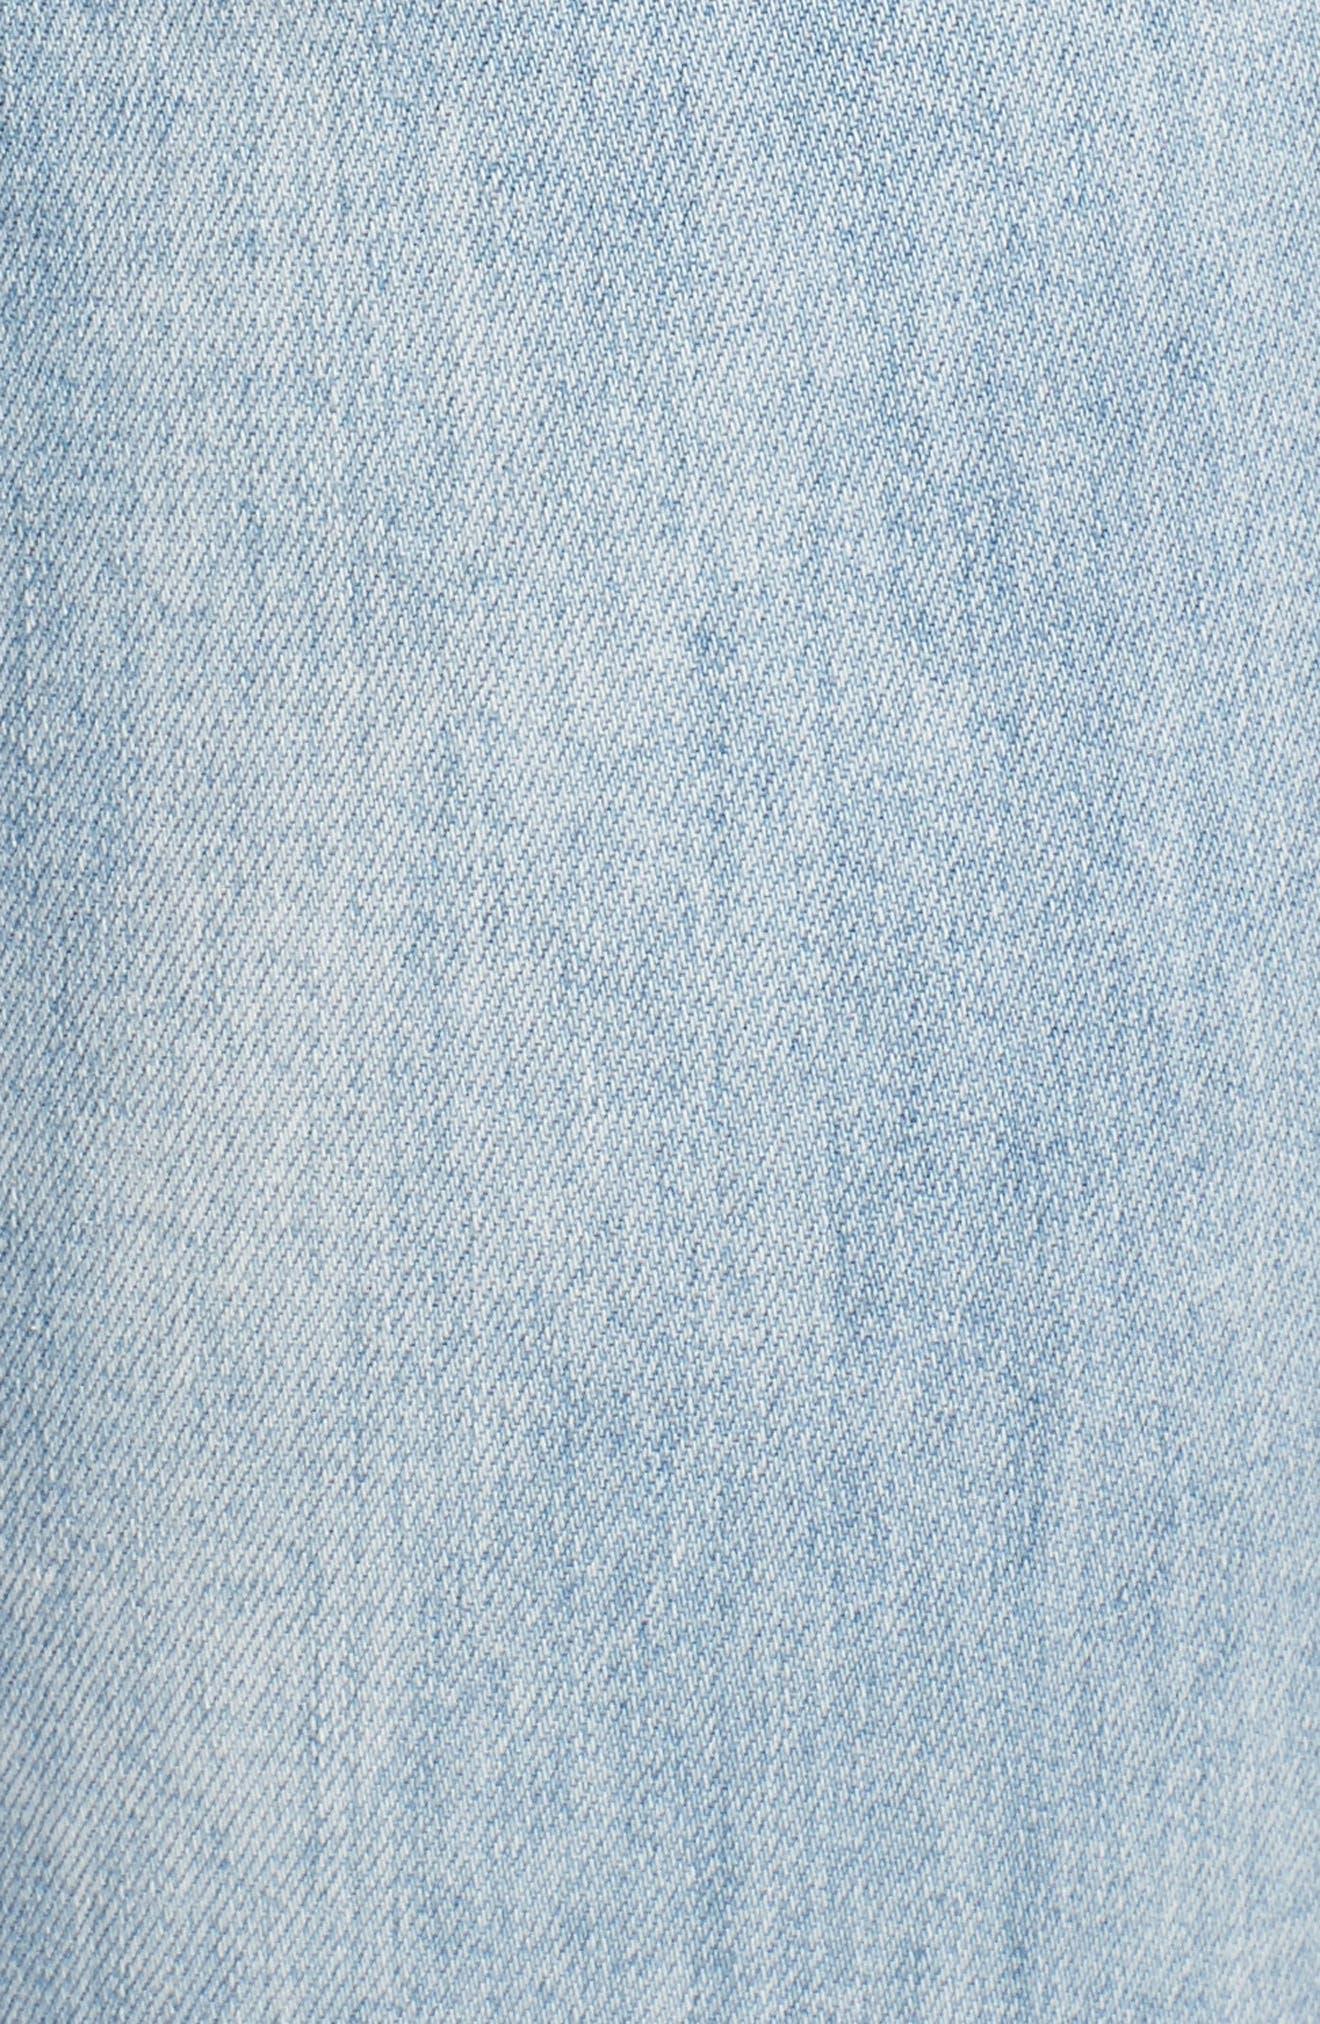 Ab-solution High Rise Crop Jeans,                             Alternate thumbnail 6, color,                             Light Blue